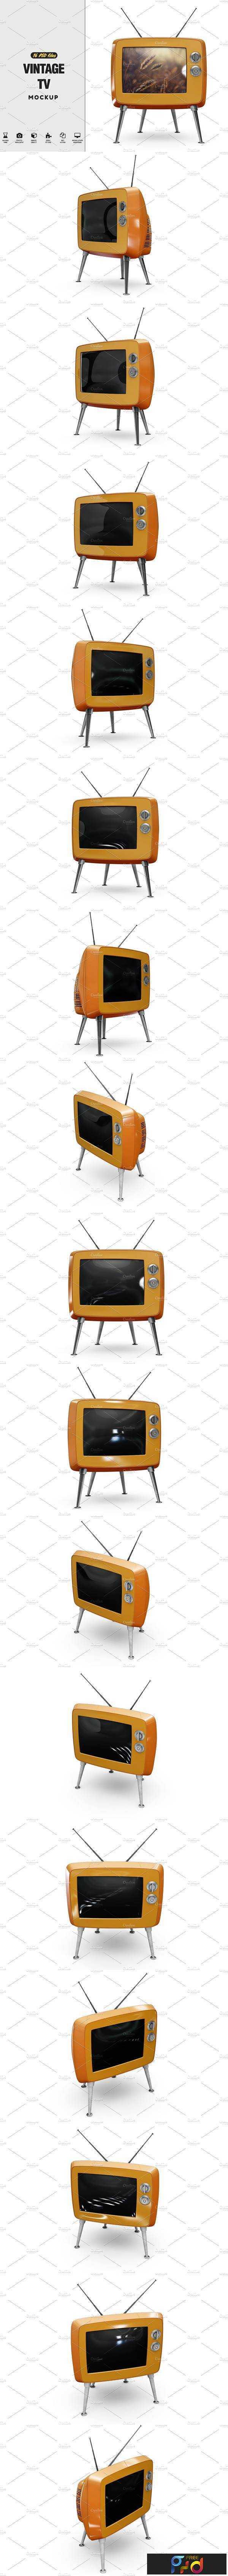 1806102 Vintage Tv Mockup 2555616 1